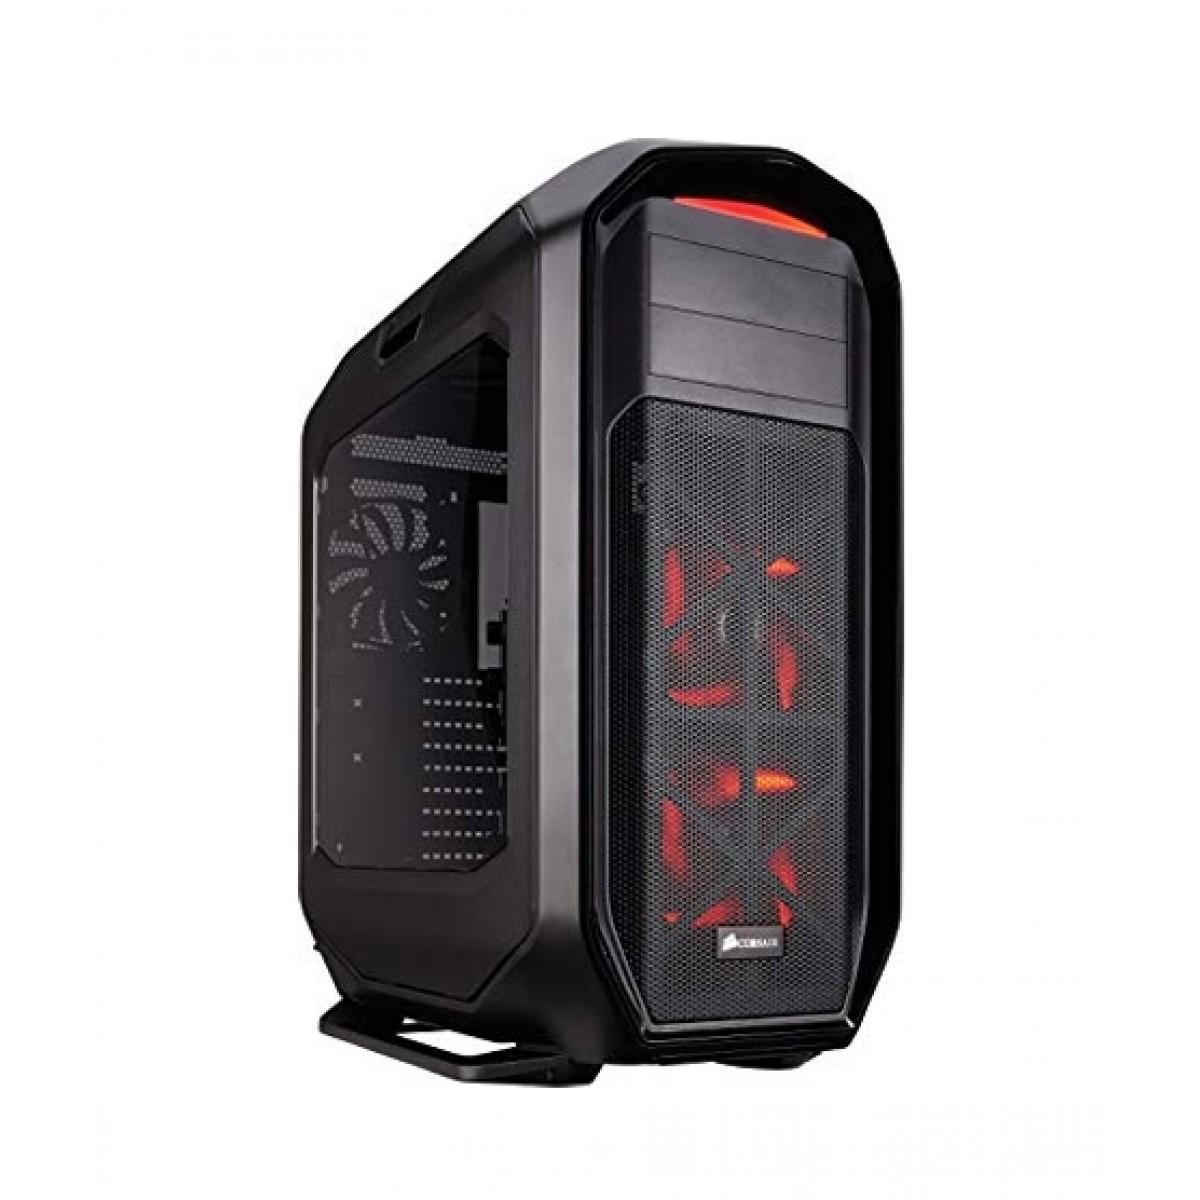 Corsair Graphite 780T Full Tower PC Case